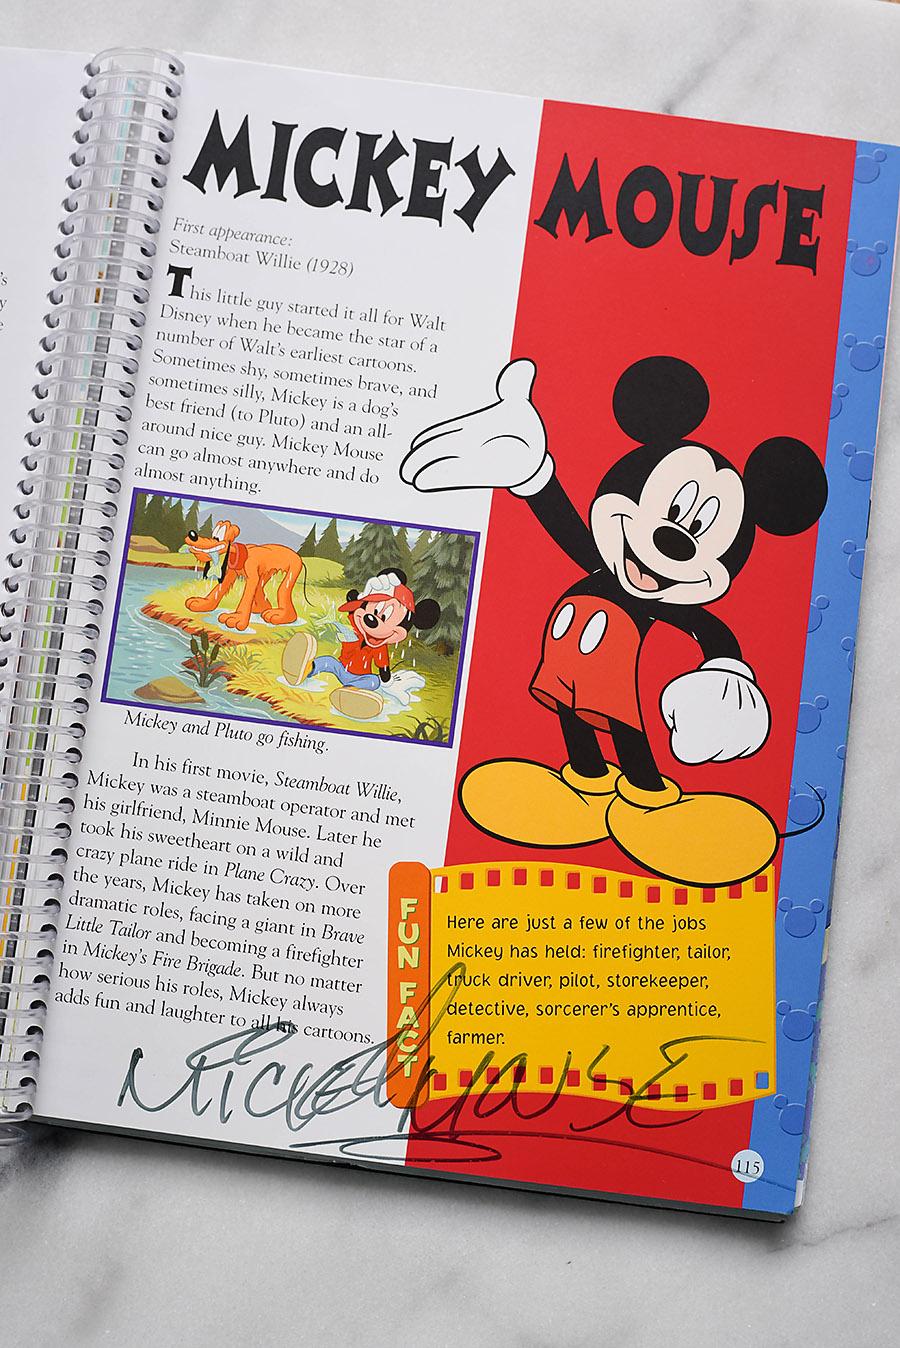 Diy Character Autograph Book For Walt Disney World Dream